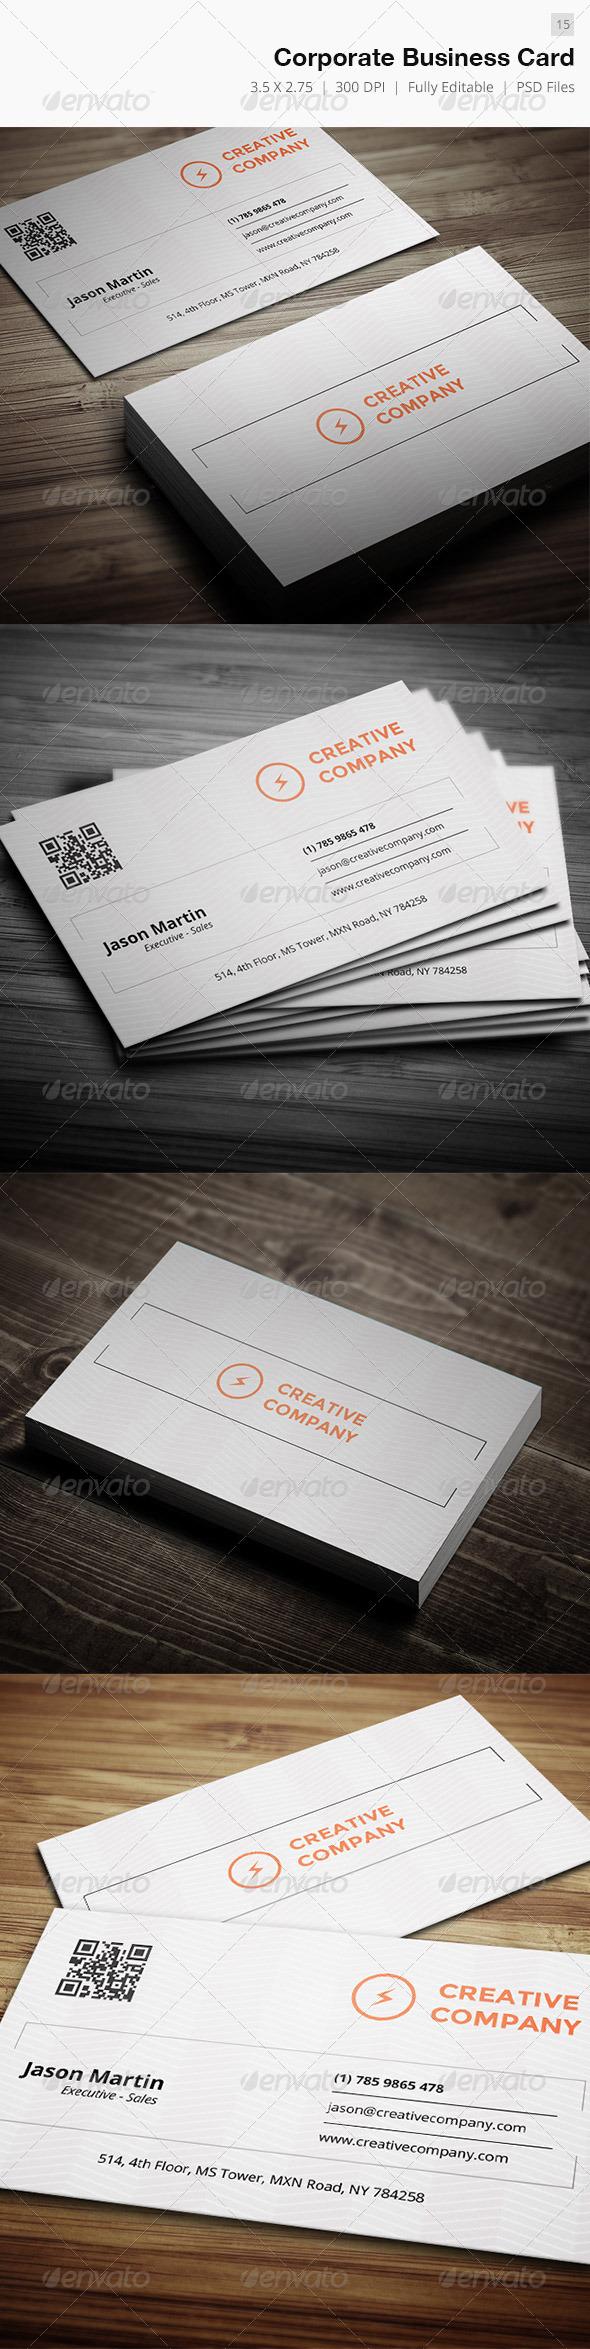 Corporate Business Card - 15 - Corporate Business Cards